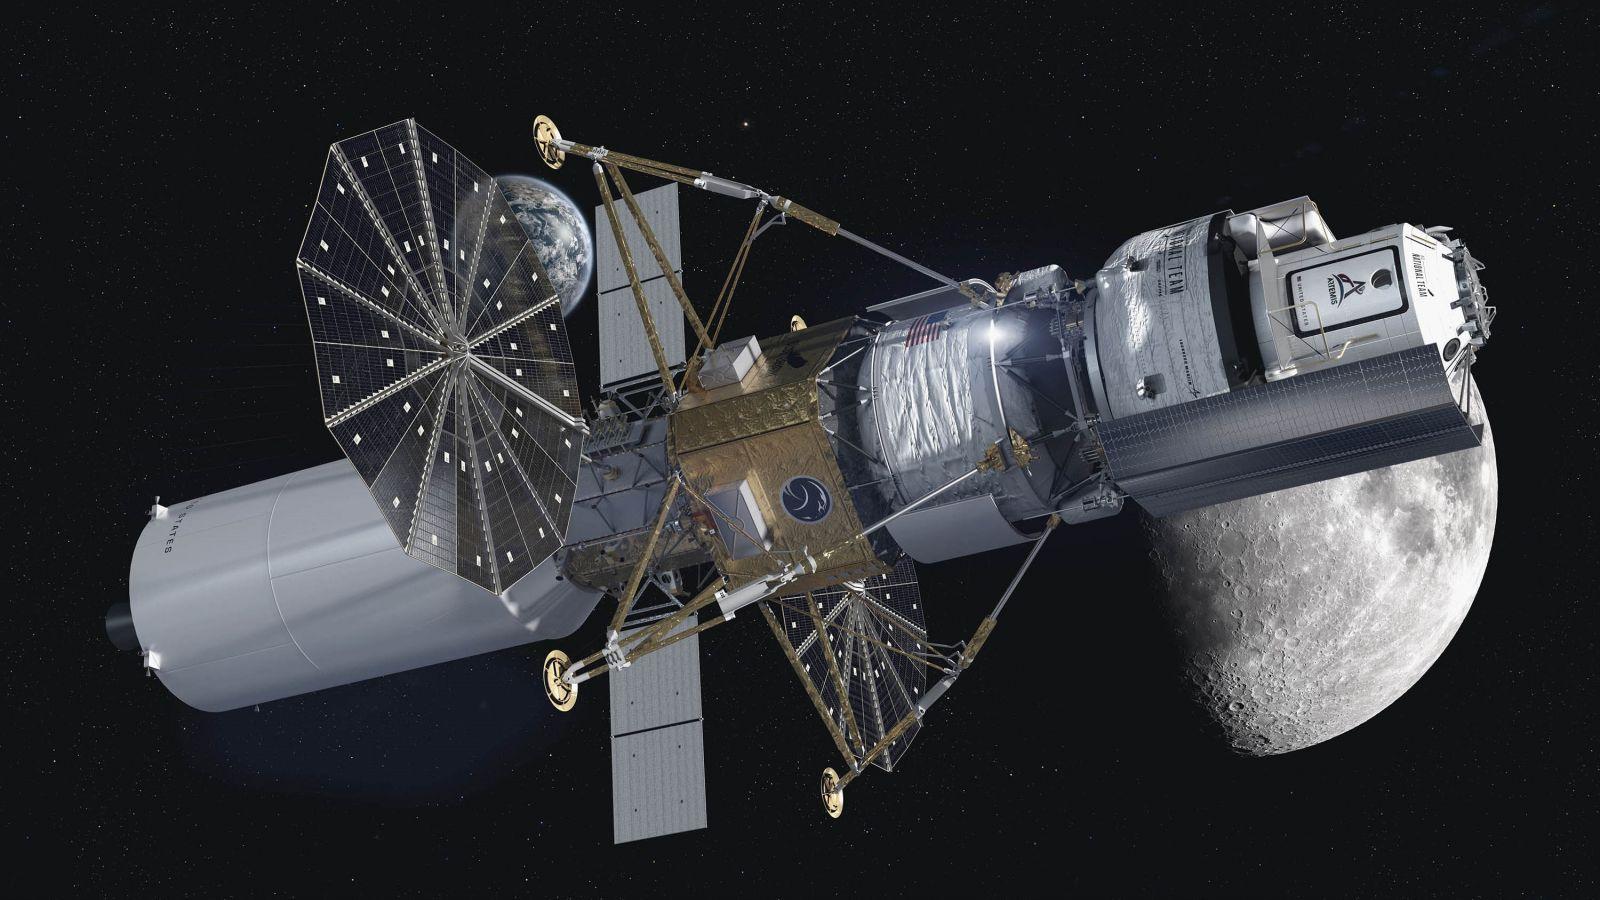 A rendering of the National Team lander design, which is being built by Blue Origin, Northrop Grumman Lockheed Martin and Draper. Credit: Blue Origin